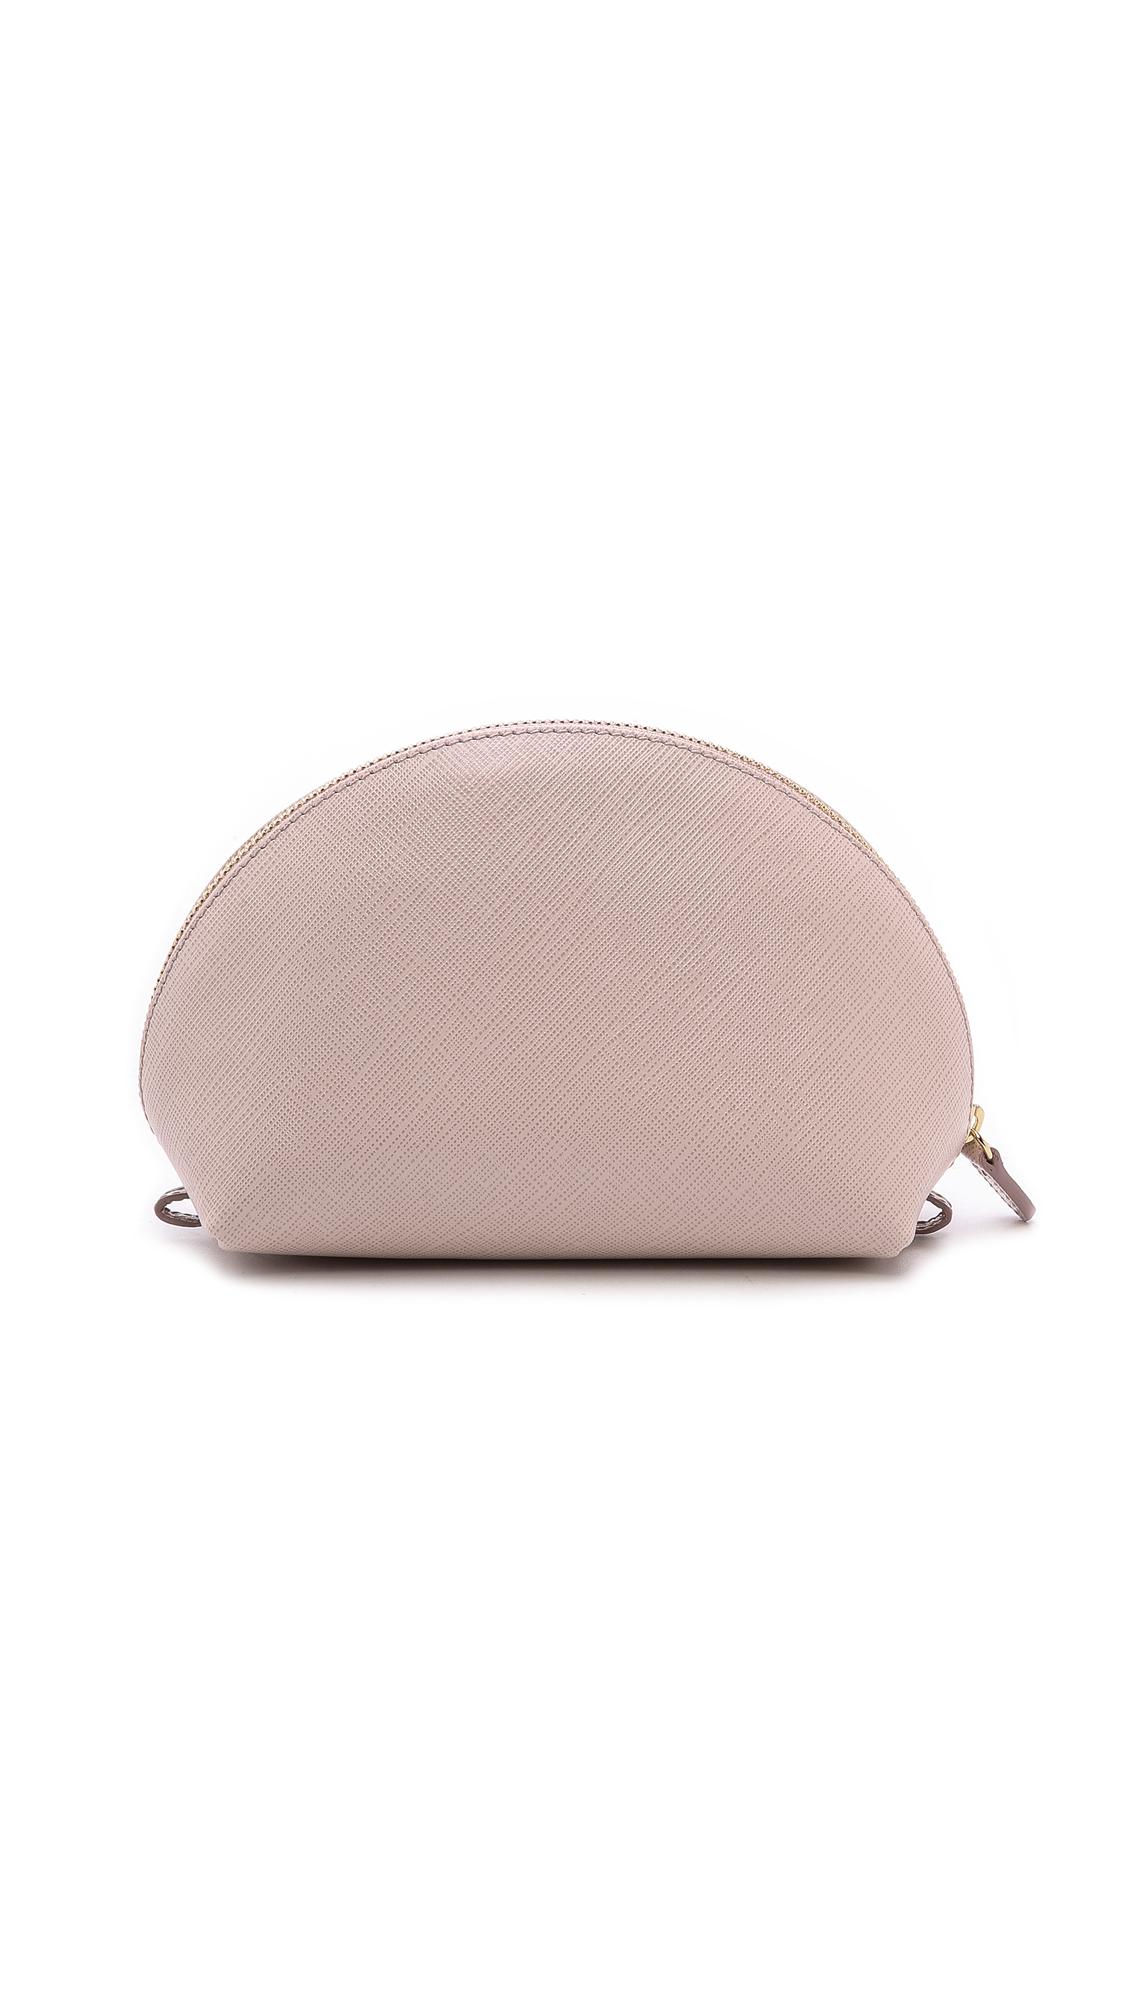 baad27b4c5 Ferragamo Miss Vara Bow Cosmetic Case - Macaron in Pink - Lyst